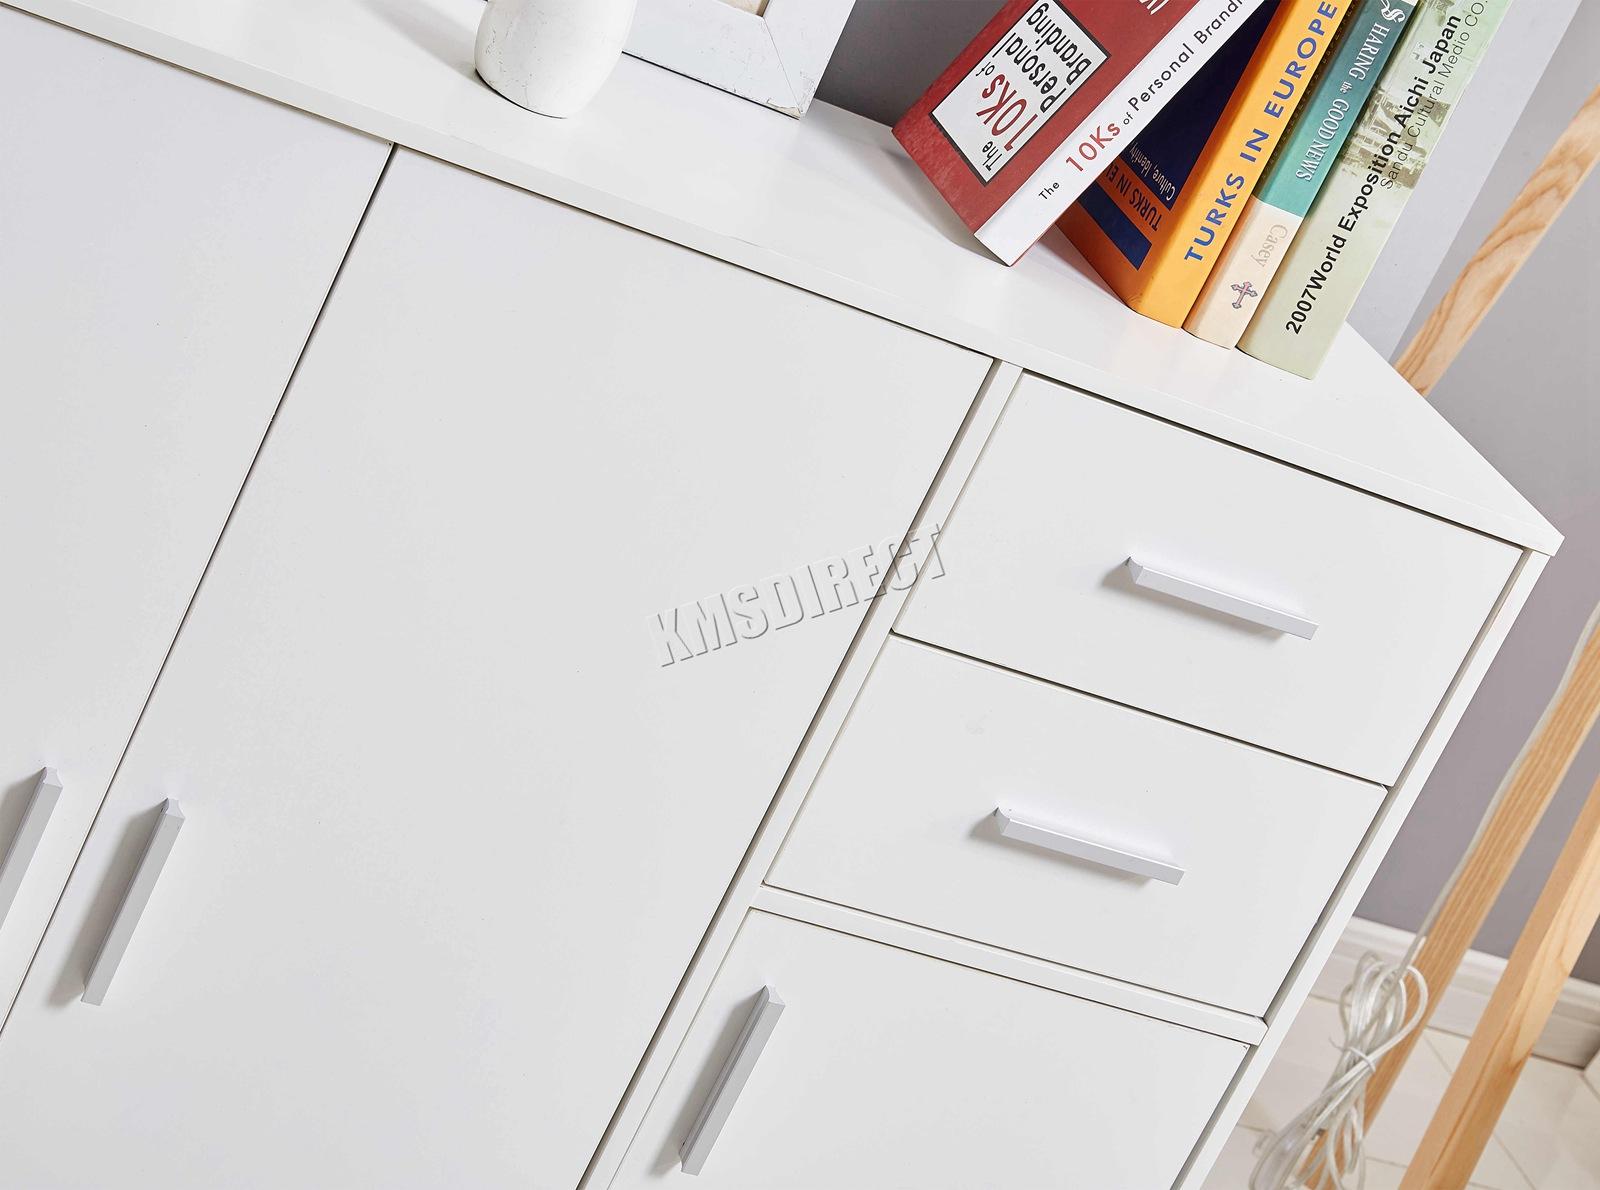 WestWood-Sideboard-Cabinet-Storage-tableware-Kitchen-Cupboard-Unit-PB-SSP01-NEW thumbnail 40